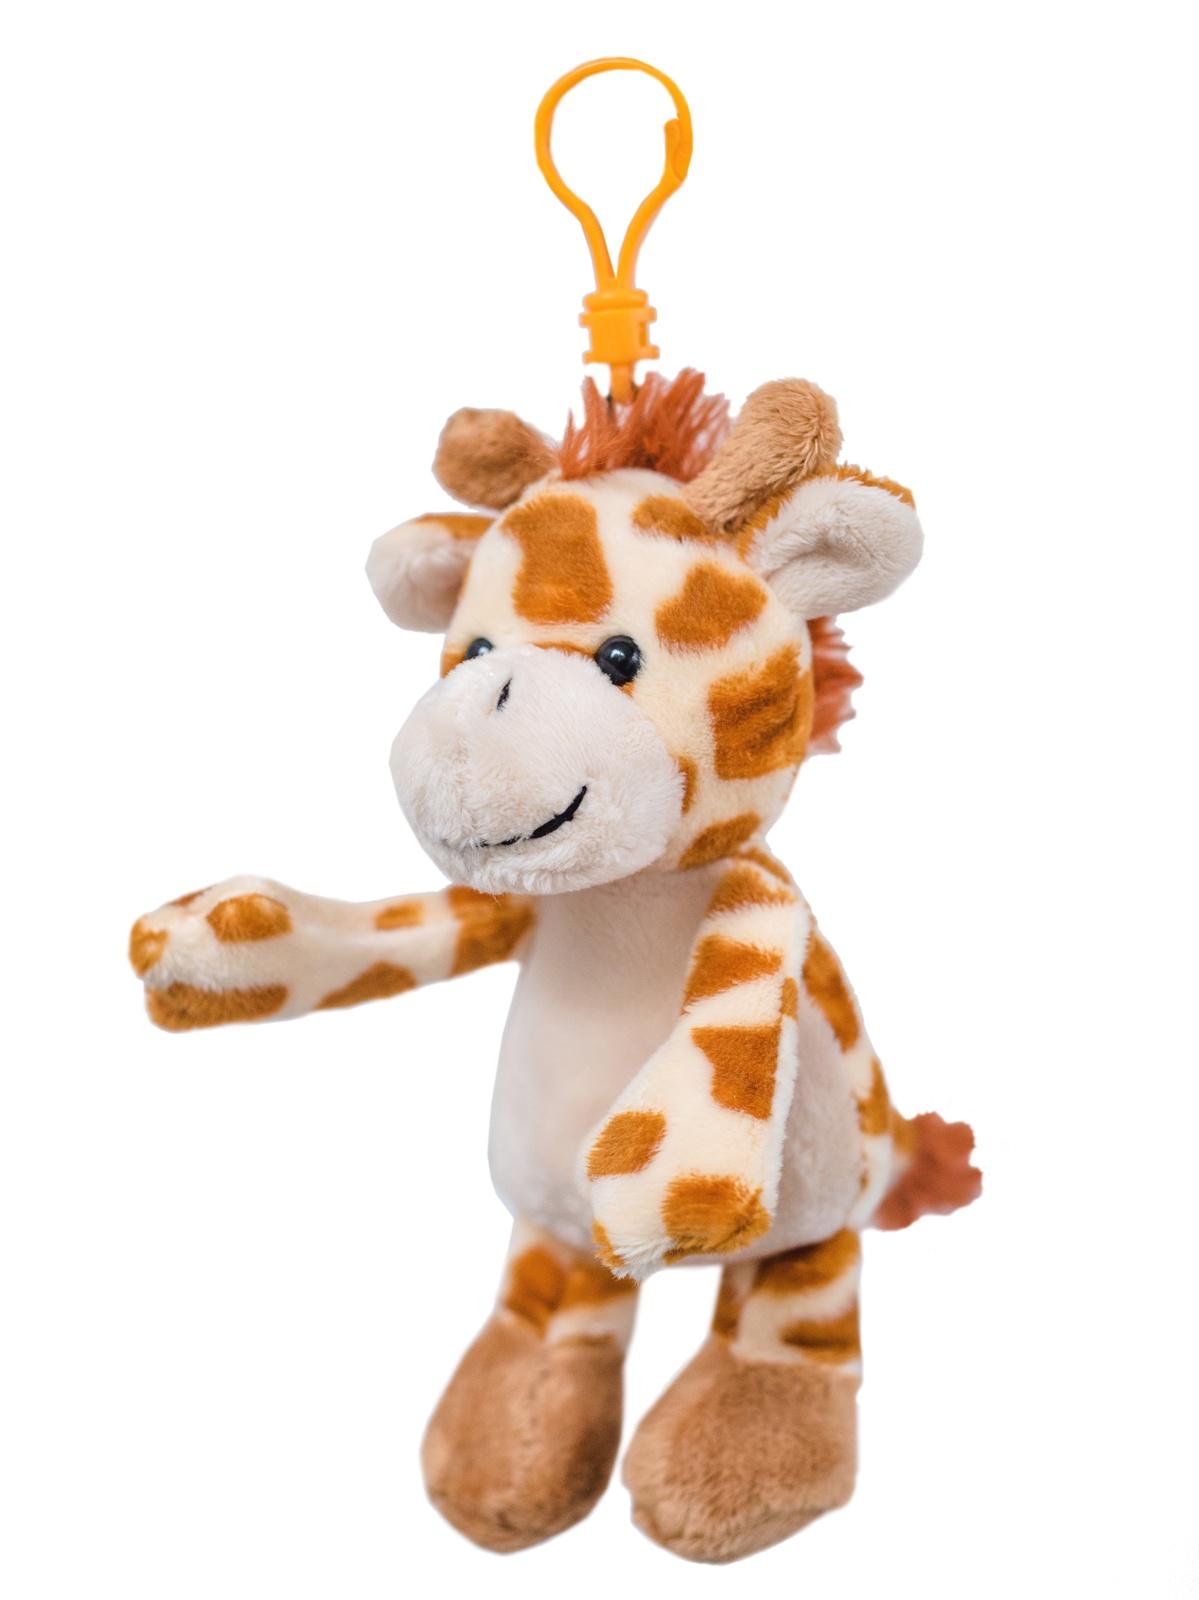 Мягкая игрушка Плюш Ленд брелок Жираф из коллекции Mini Zoo оранжевый цена